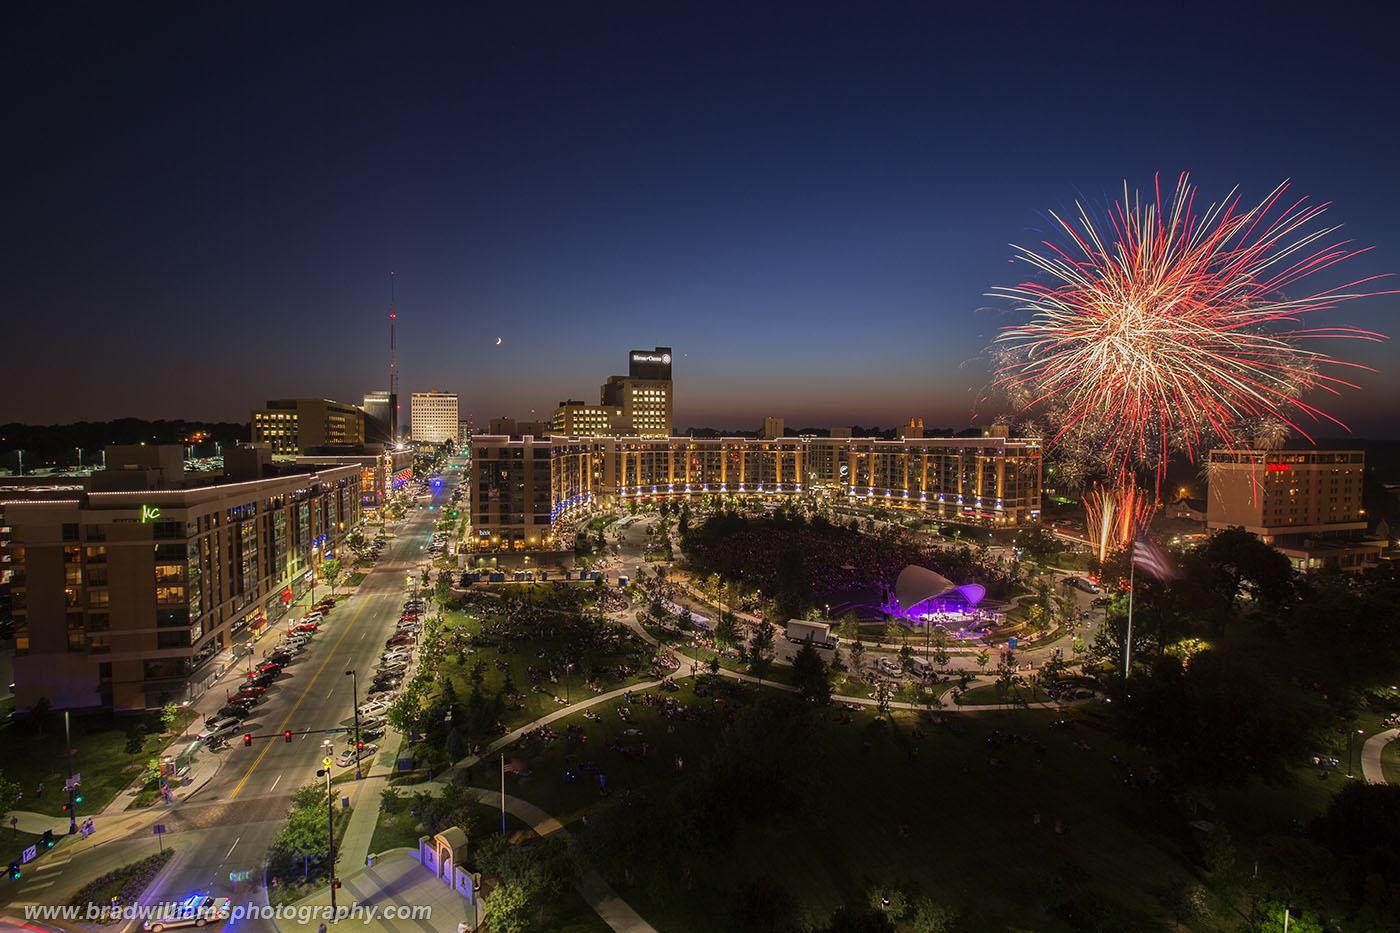 Midtown Crossing, Omaha, Nebraska, Fireworks, photo